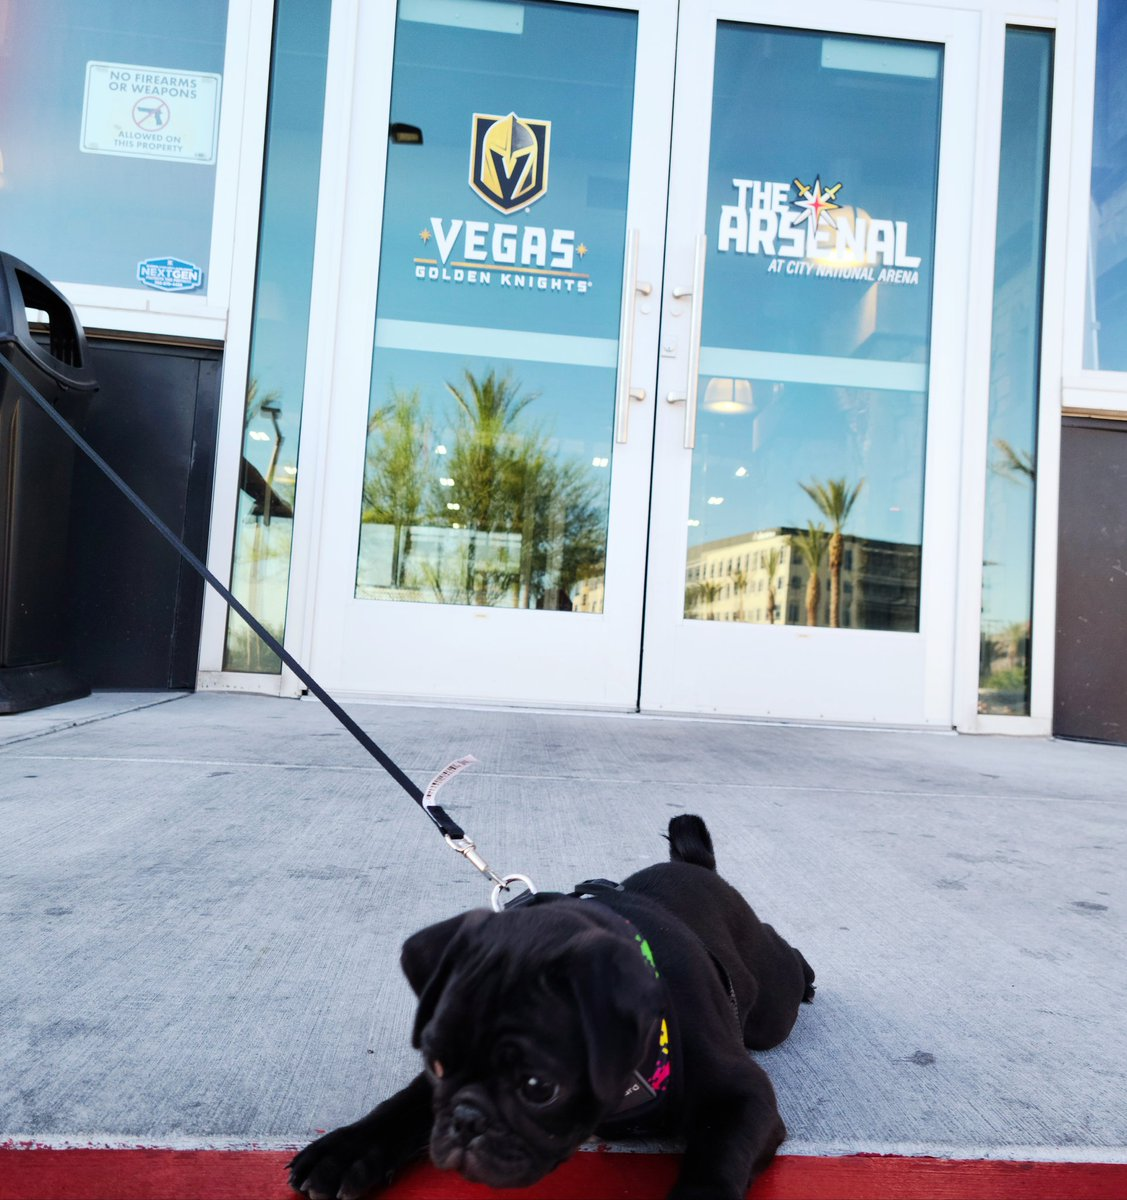 #SundayFunday  #vegasgoldenknights #VegasBorn #GoKnightsGo  #NHLPlayoffs #puglife #pugs #pug #pugsoftwitter #pugchatpic.twitter.com/mAQBah3tor